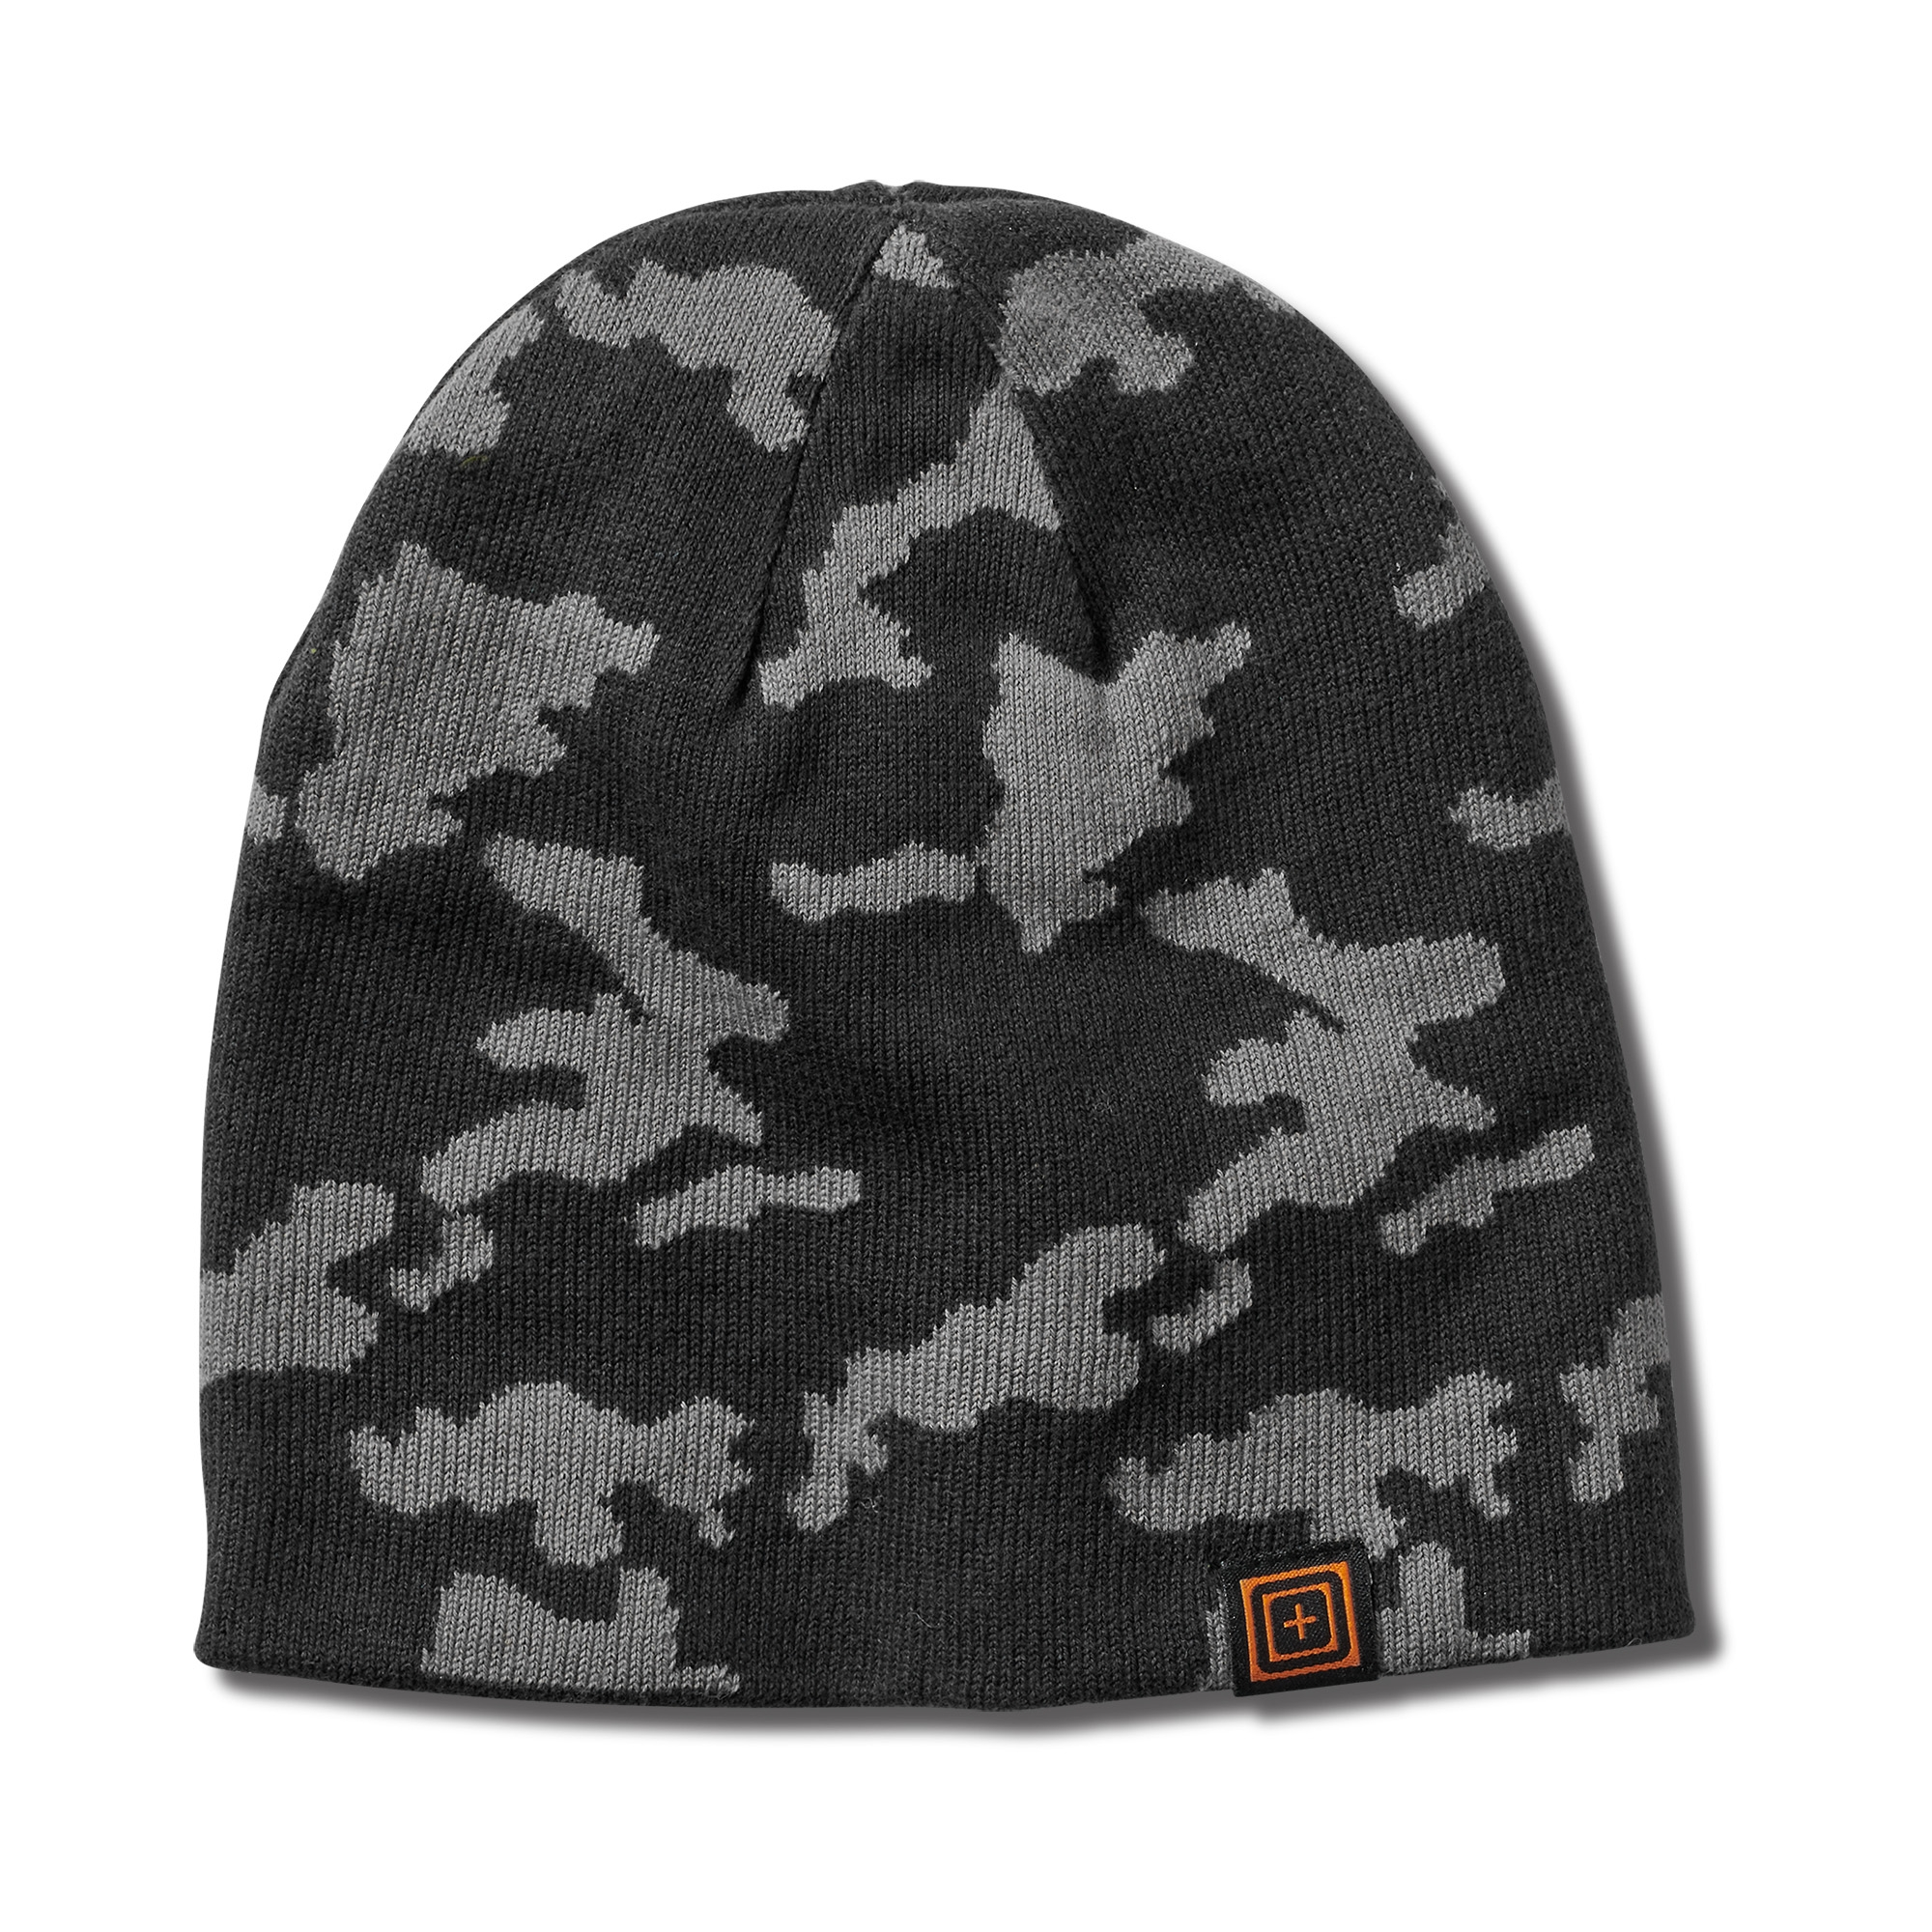 5.11 Tactical Men's Jacquard Beanie (Black) thumbnail